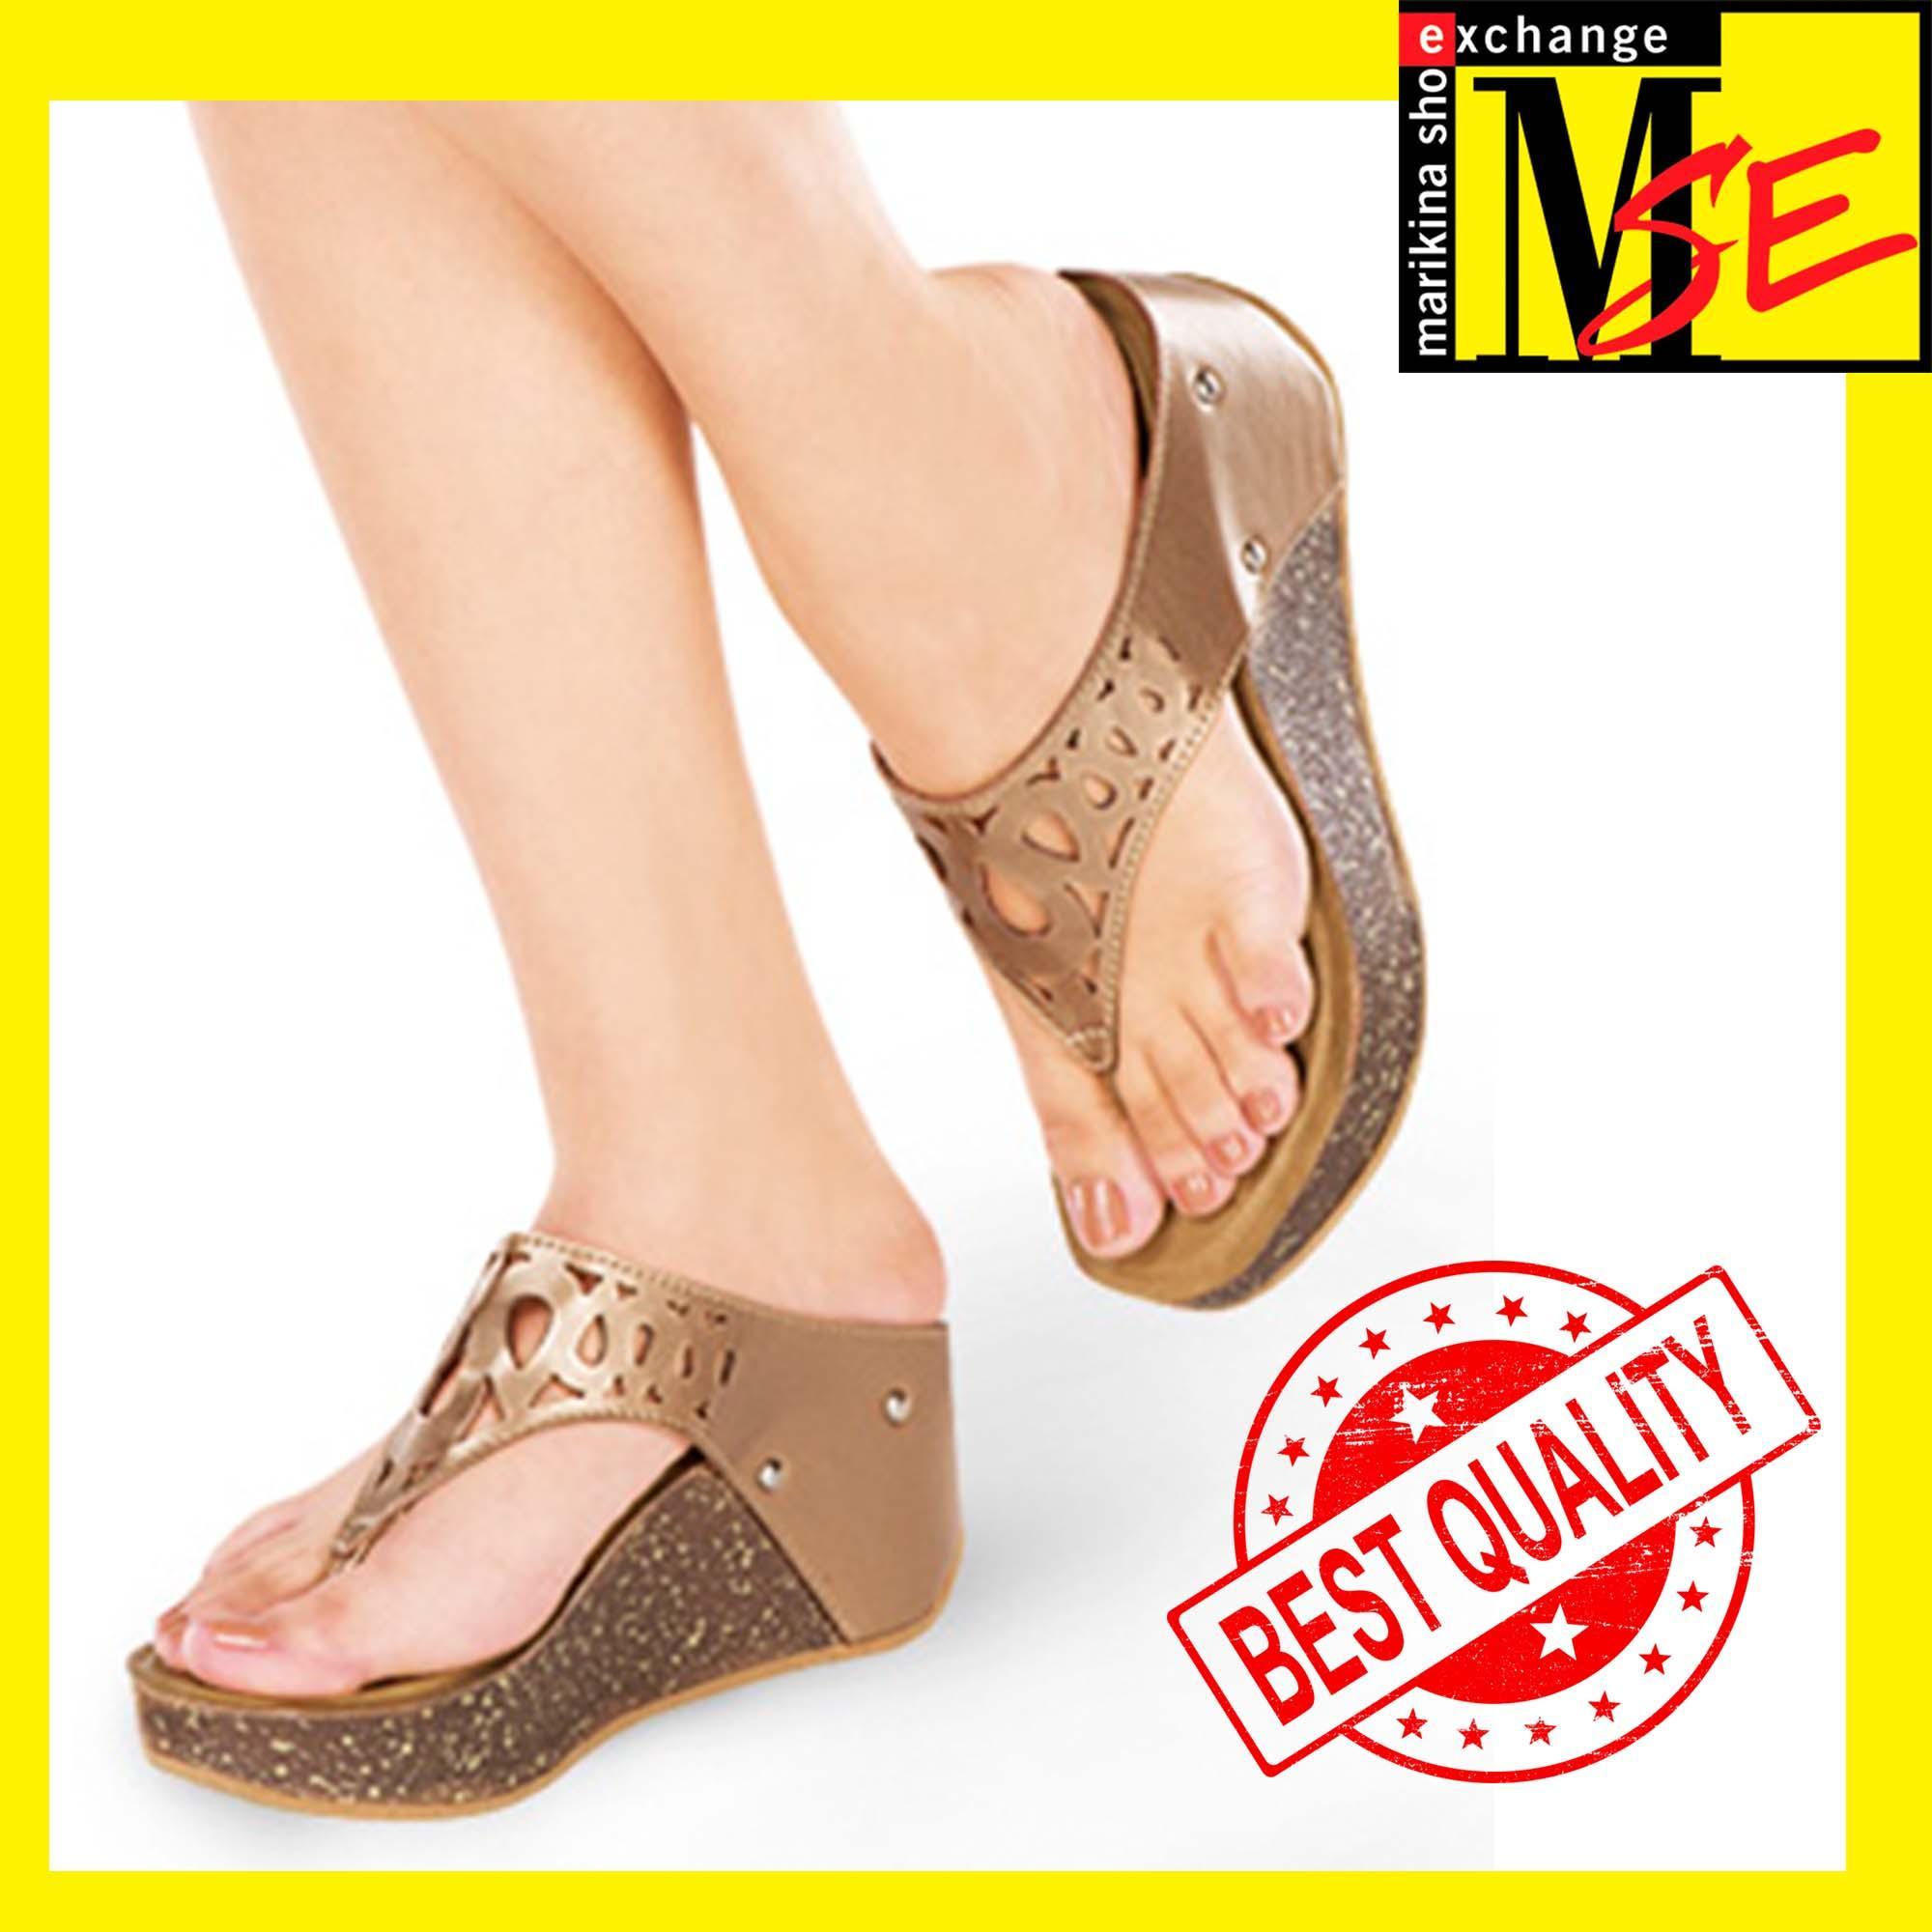 Womens Heel Shoes For Sale High Heels Online Brands Prices Sepatu Boot Wanita Rc316 Mse Wedge Sandals Women Casual Party Brown Marikina Shoe Exchange